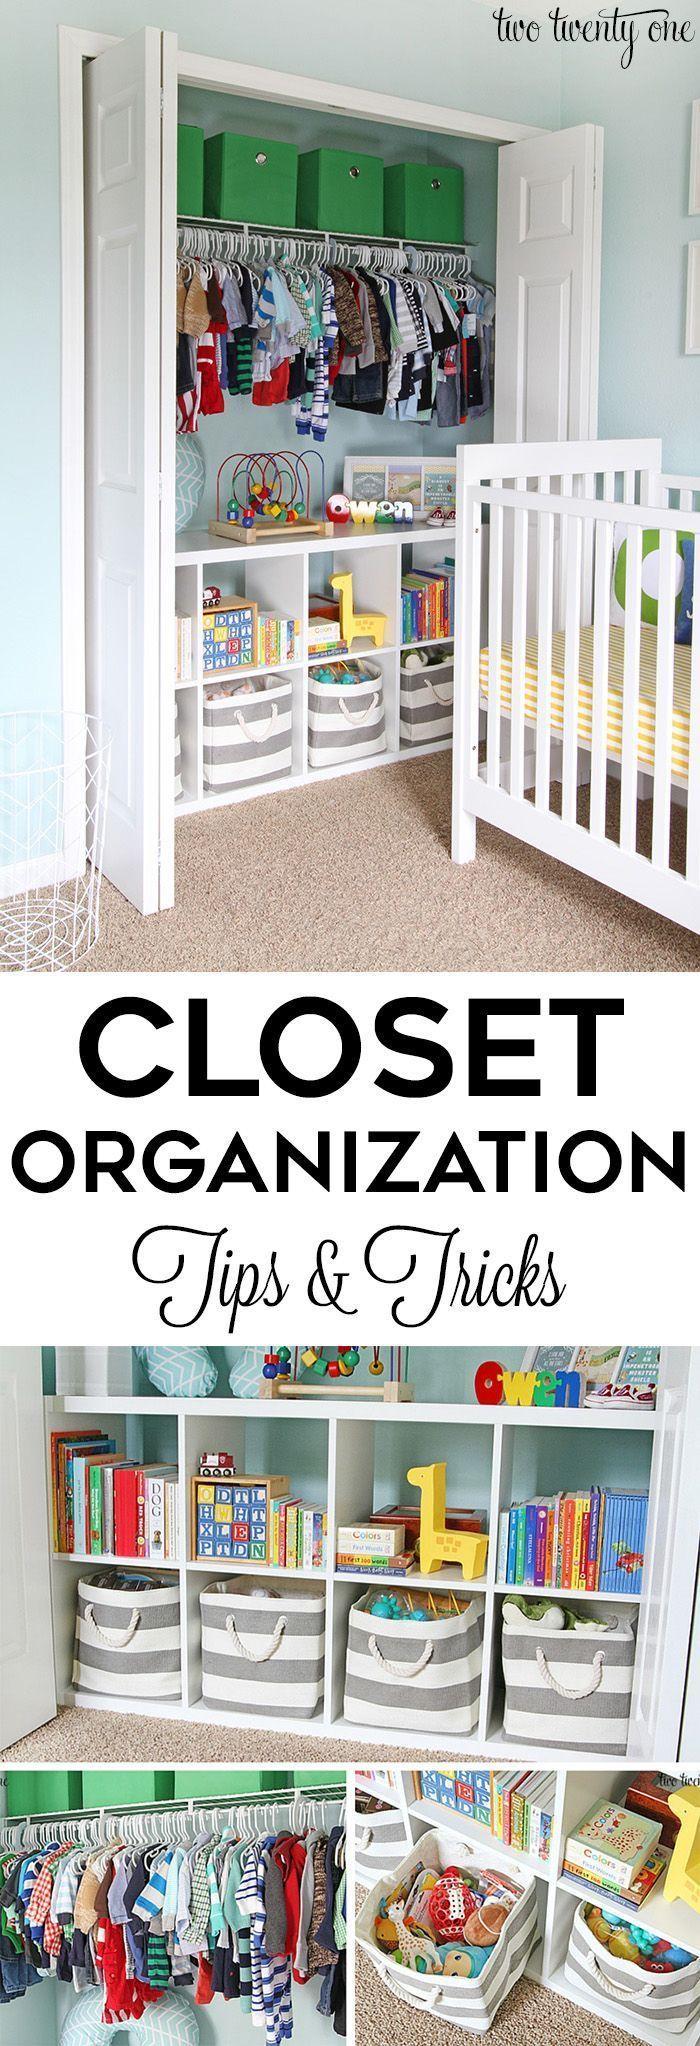 749 best Organization images on Pinterest   Organization ideas, Good ...